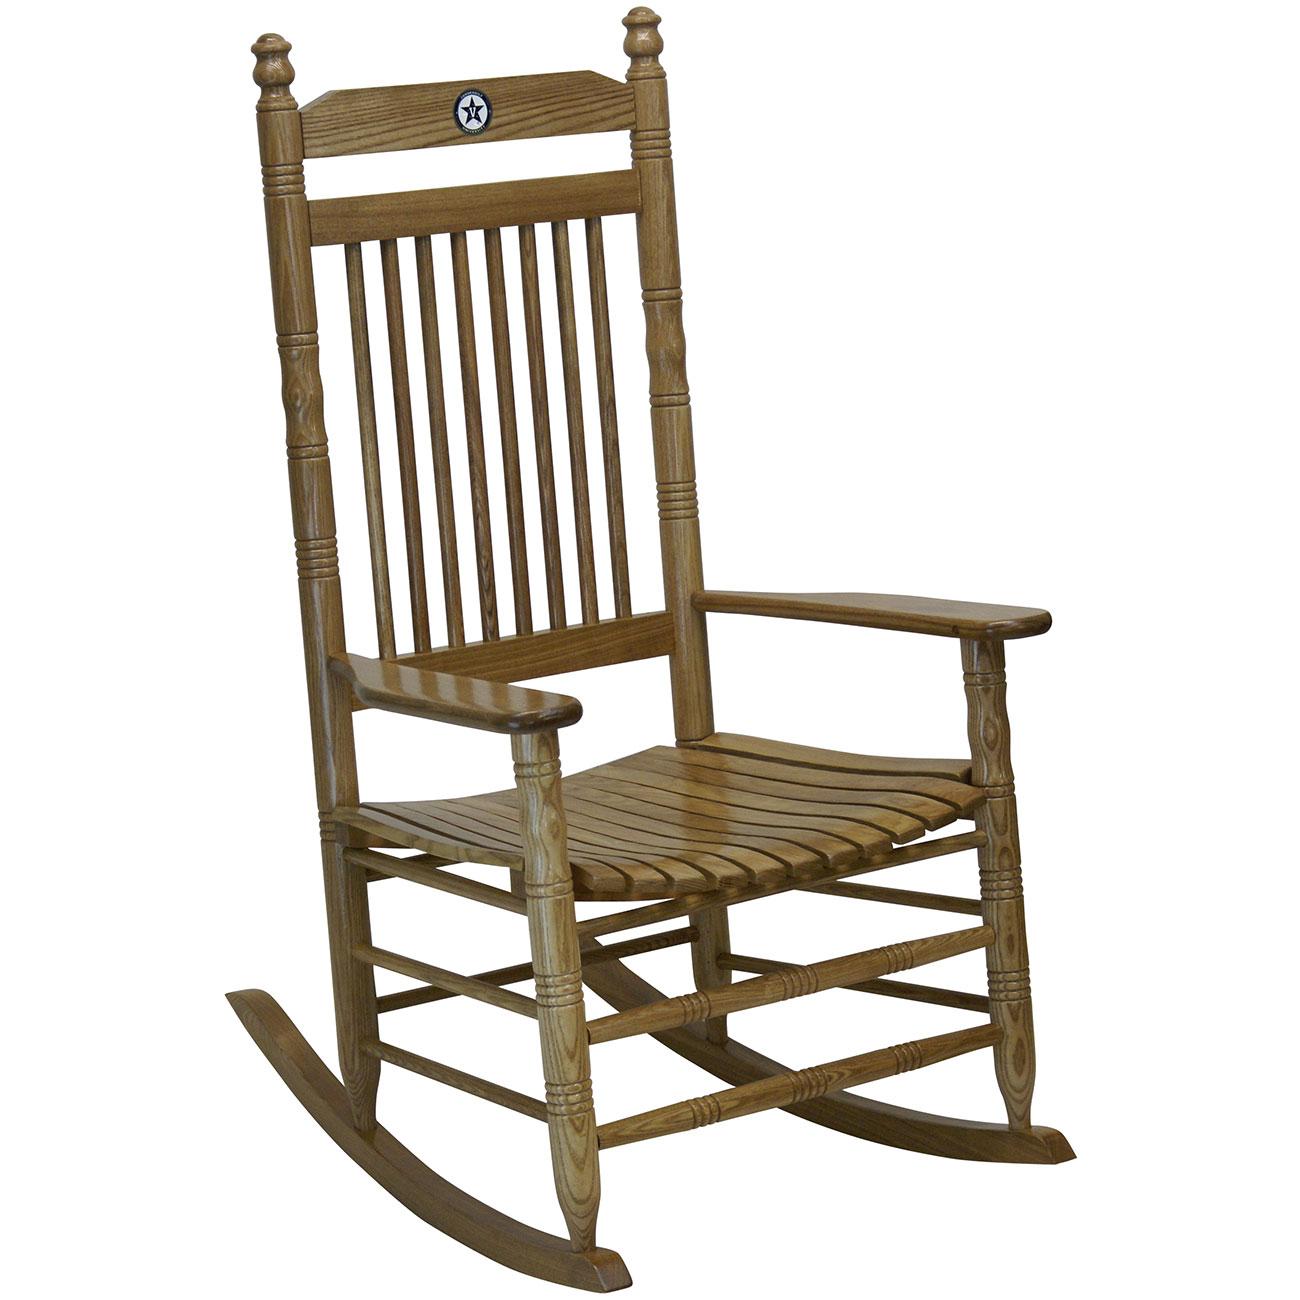 Shop.crackerbarrel.com: Hardwood Rocking Chair   Vanderbilt   Cracker  Barrel Old Country Store